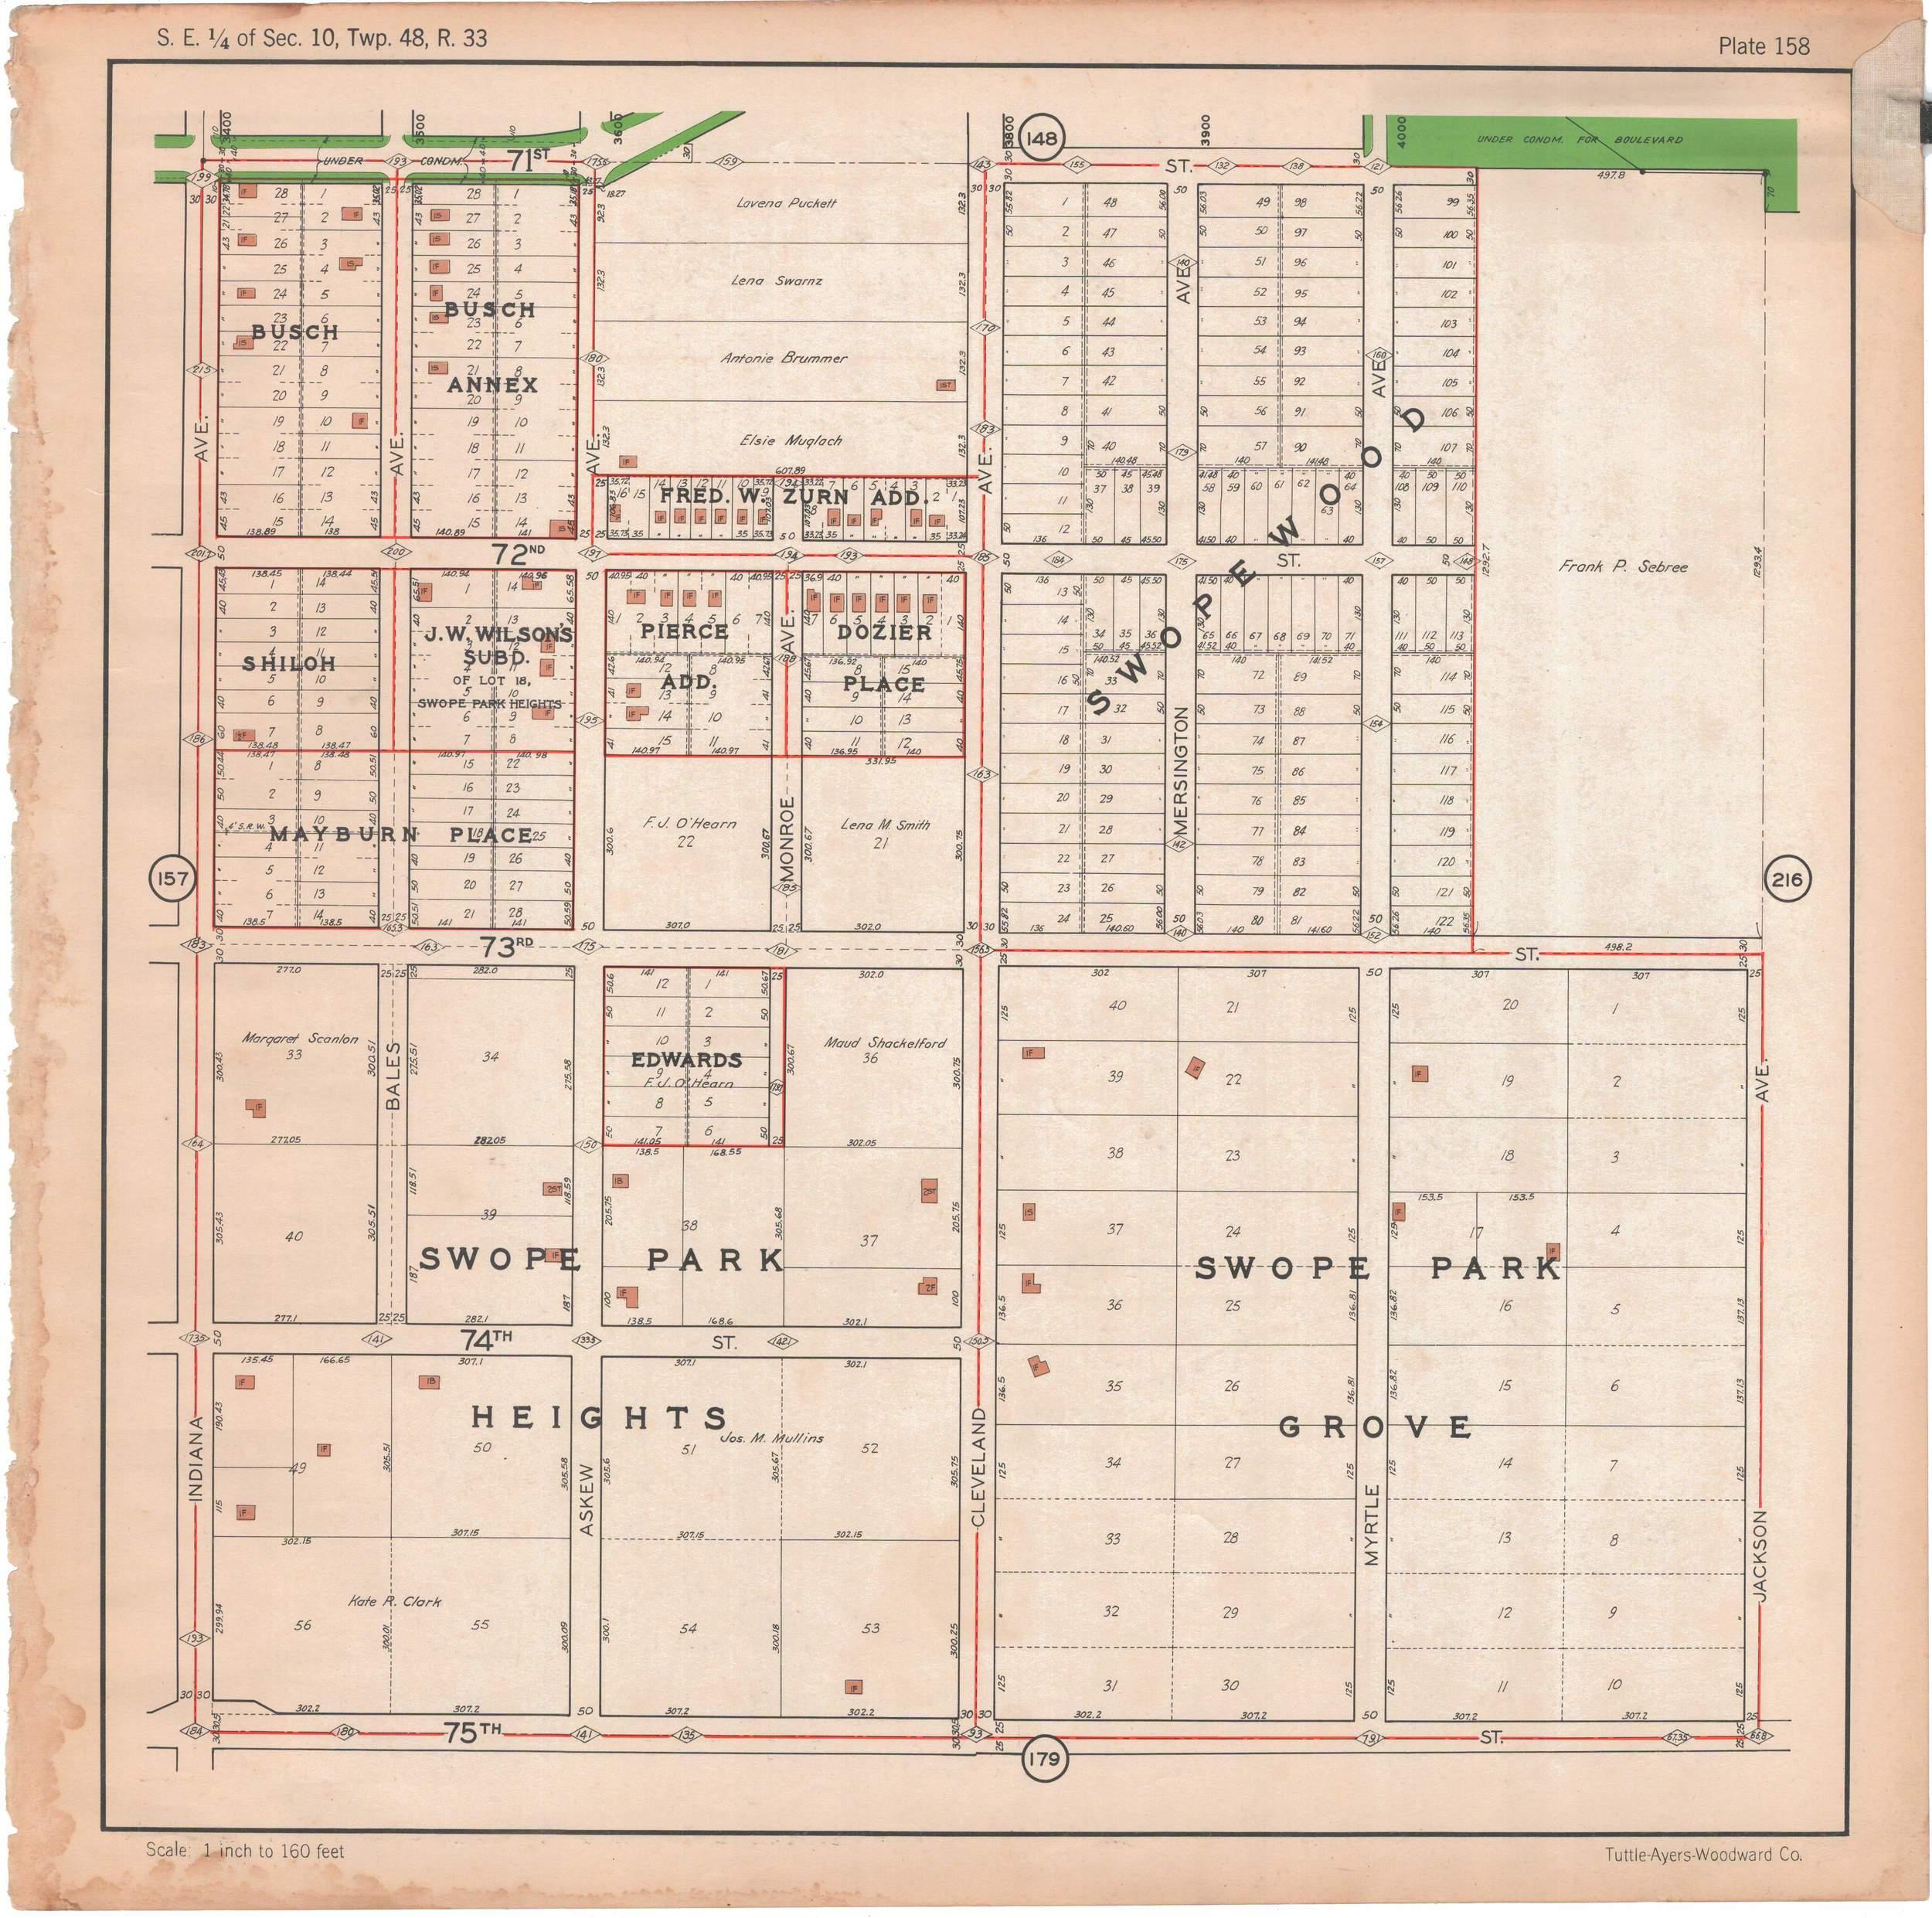 1925 TUTTLE_AYERS_Plate_158.JPG